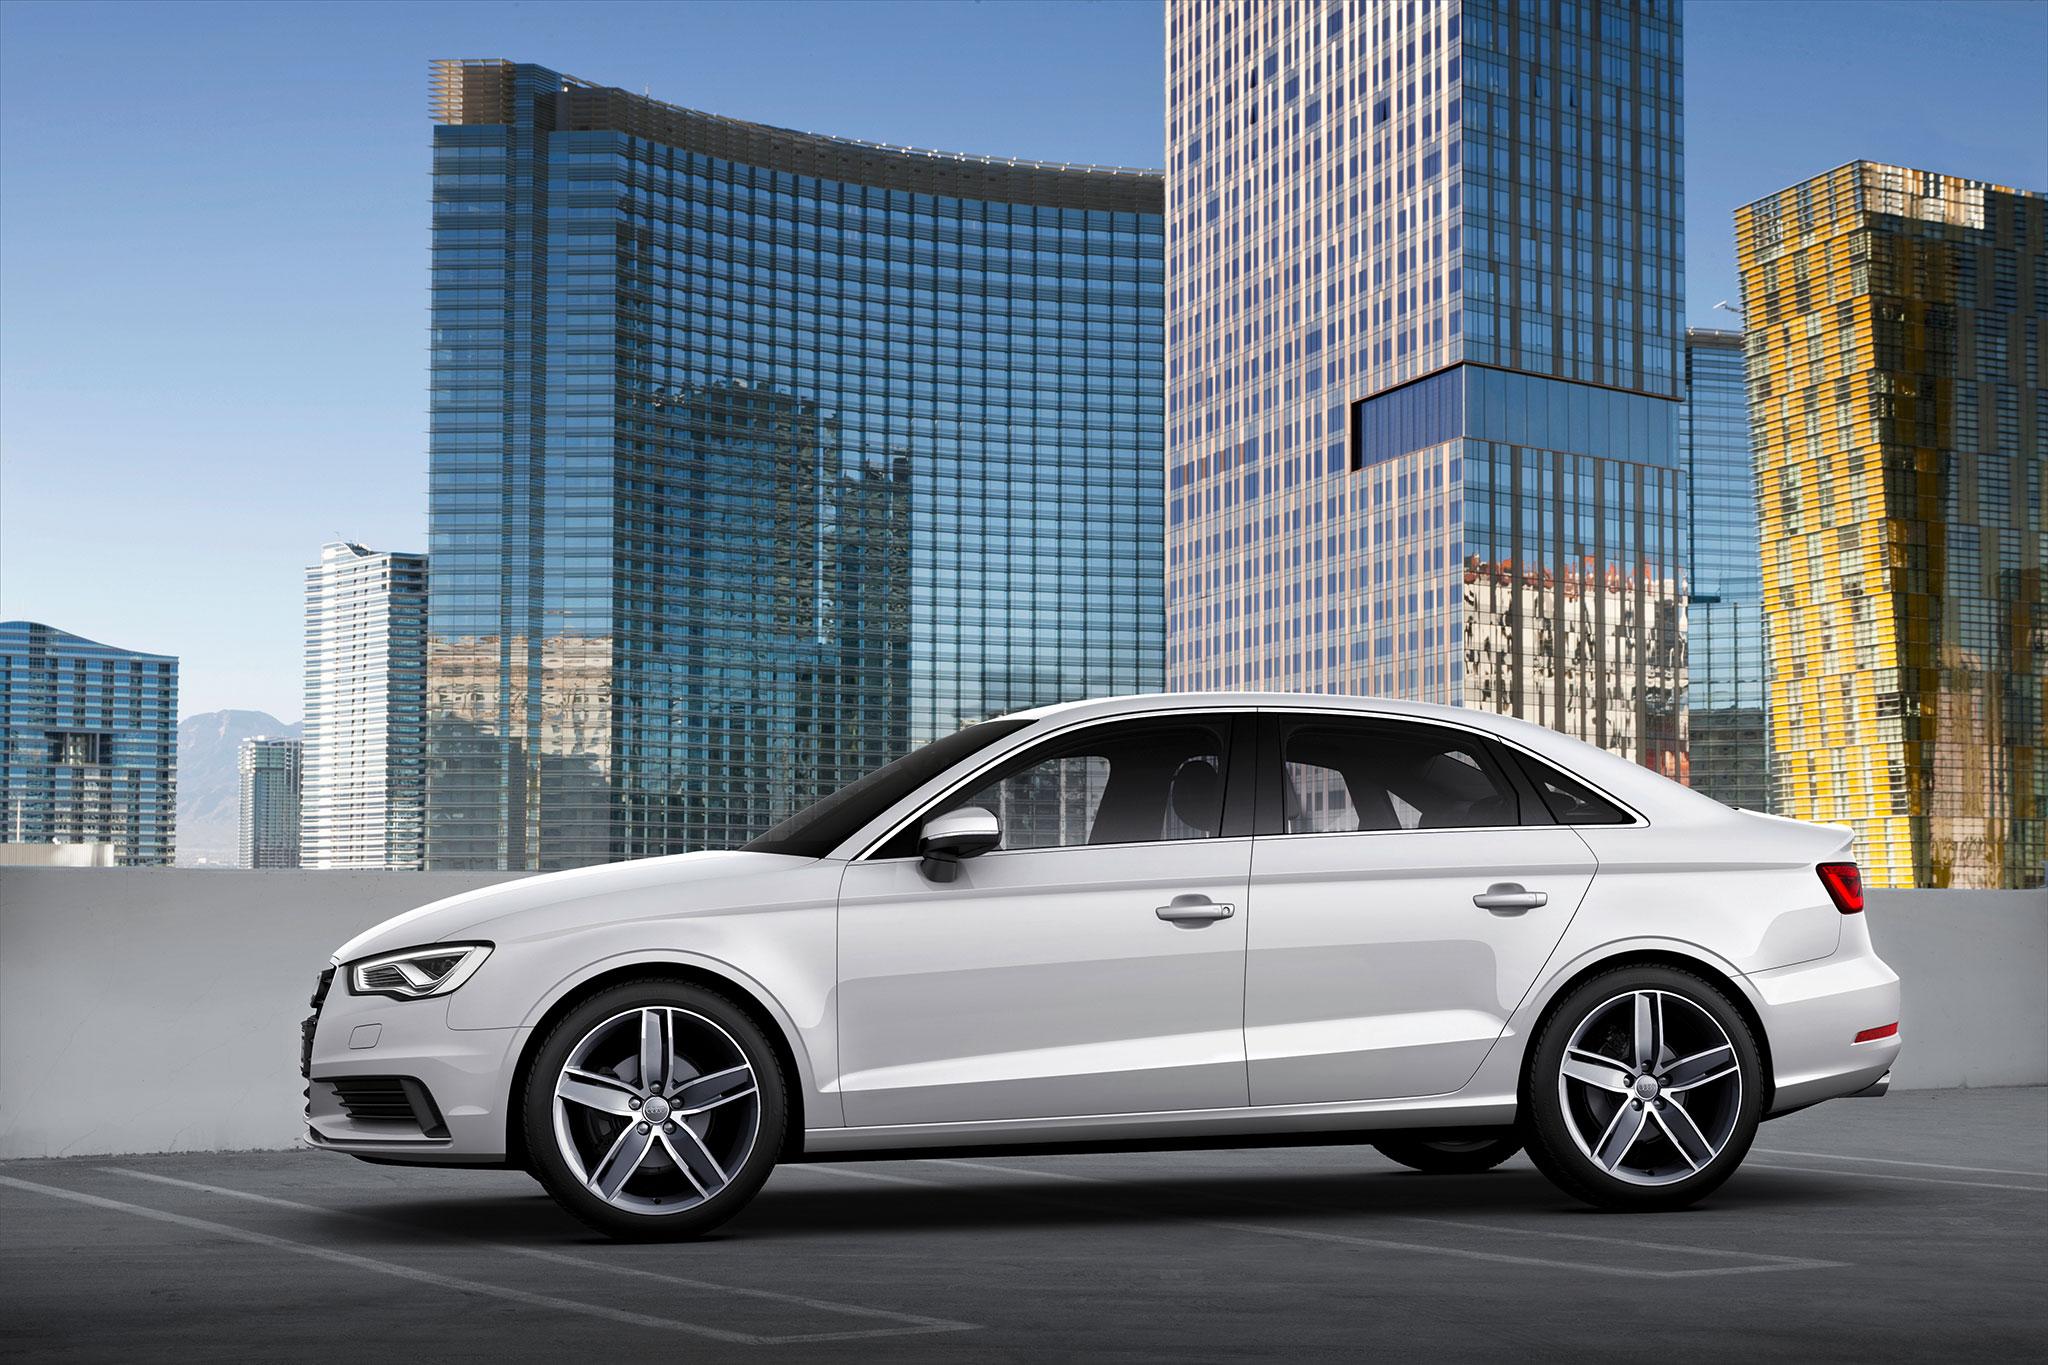 2015 audi a3 pricing and options list detailed automobile magazine 2015 audi a3 sedan 42250 altavistaventures Gallery